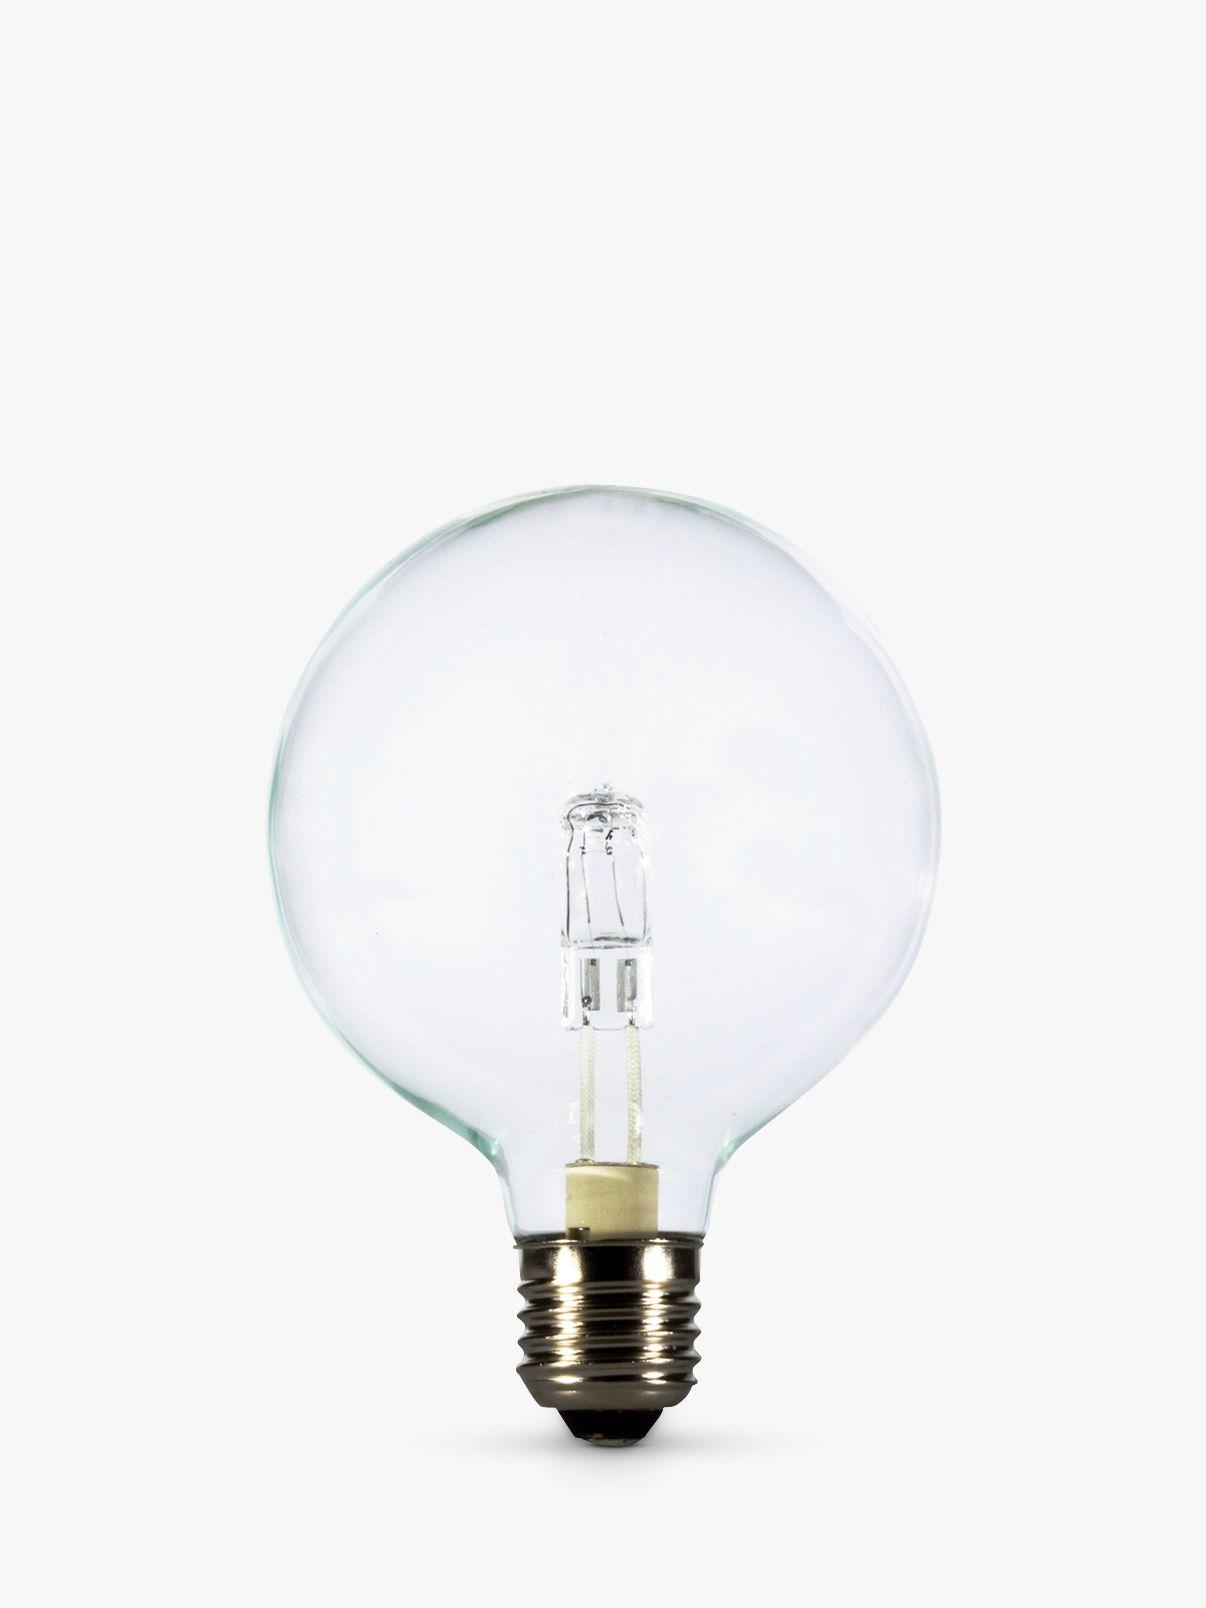 Calex Calex 28W ES Halogen Globe G95 Bulb, Clear